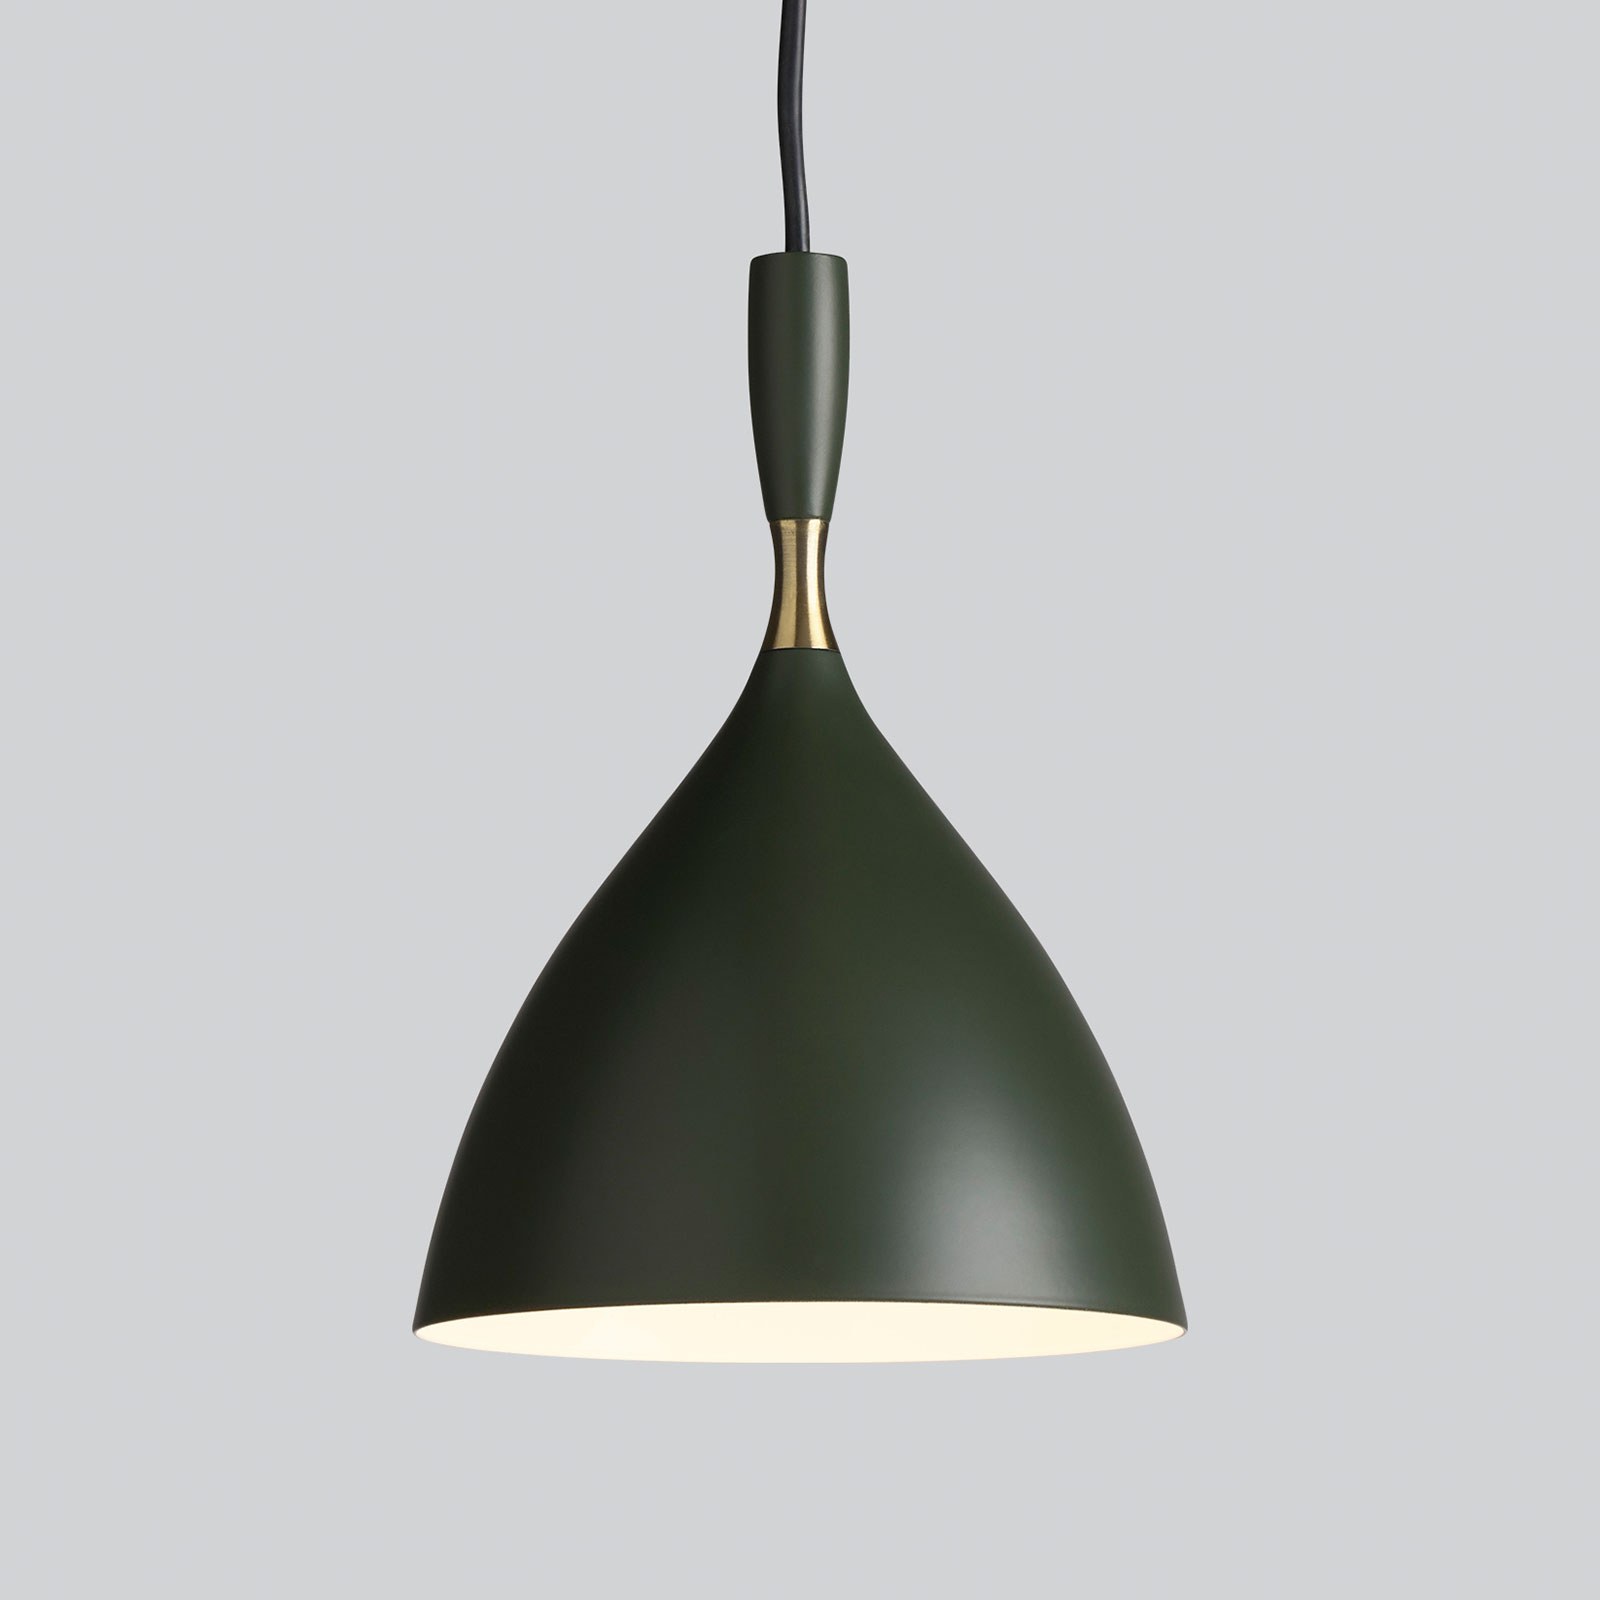 Northern lampa wisząca Dokka ciemnozielona